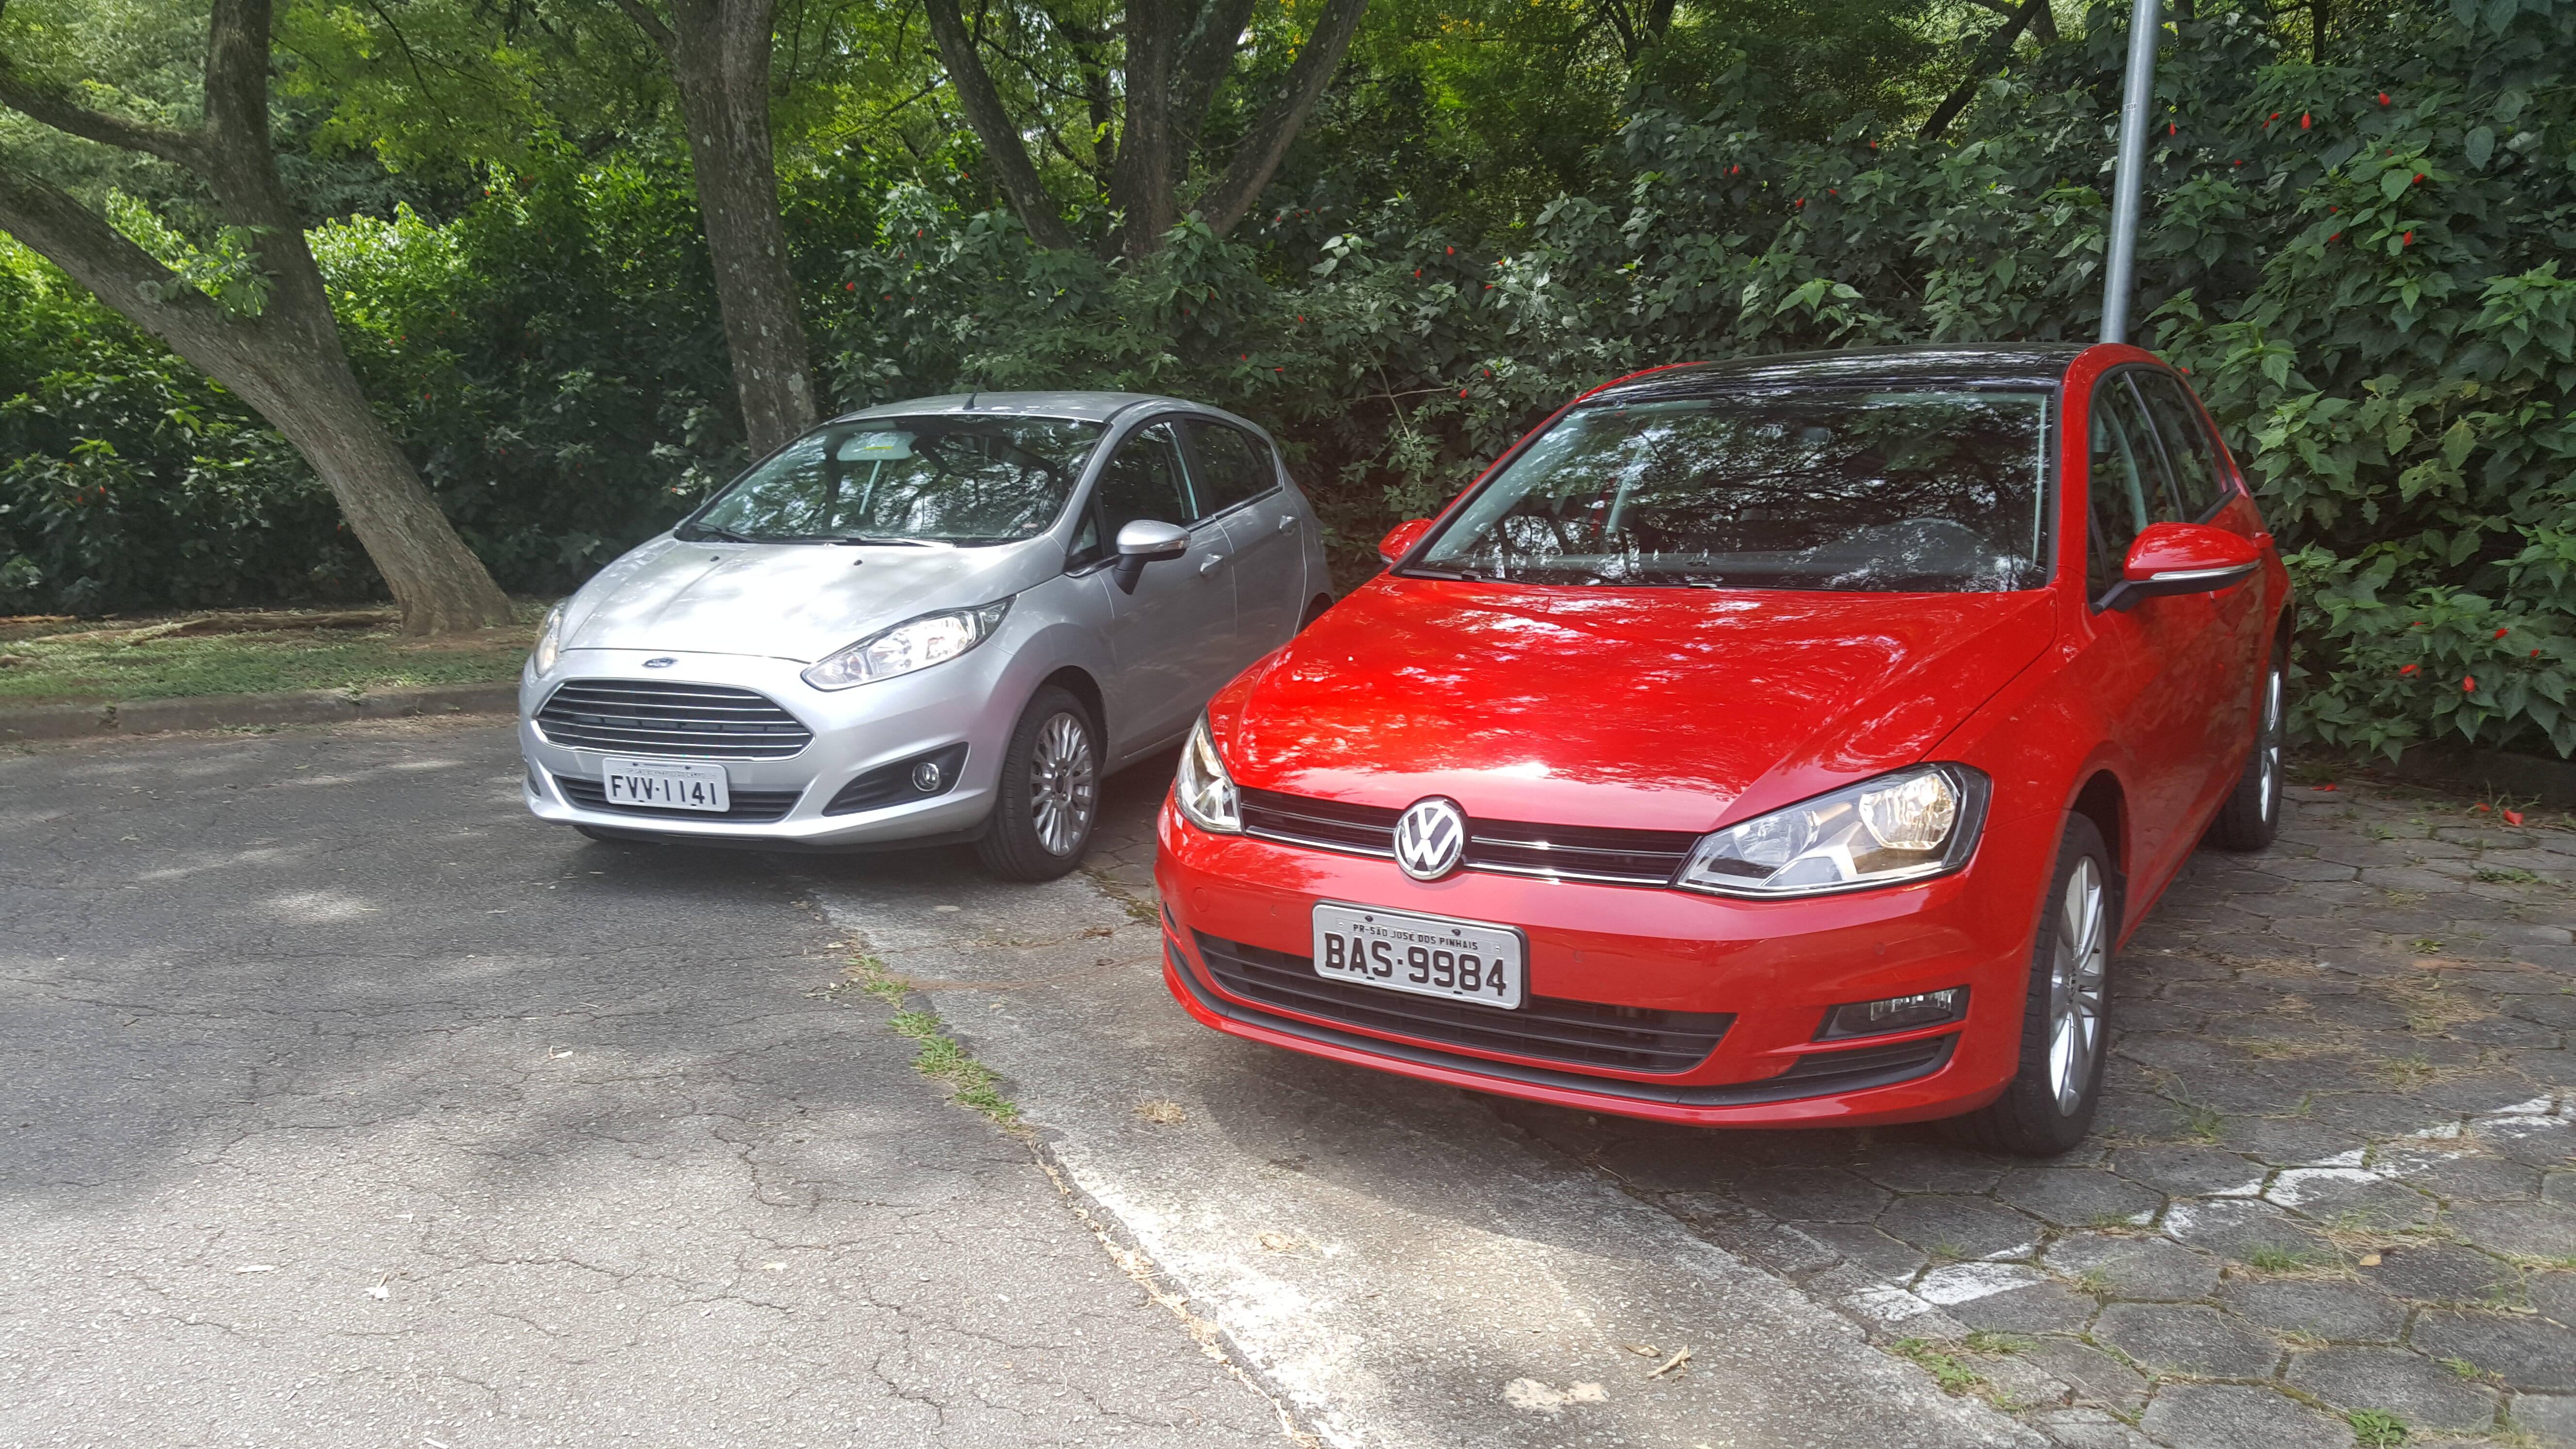 Ford Fiesta EcoBoost encara Volkswagen Golf TSI. Foto: Nicolas Tavares/iG